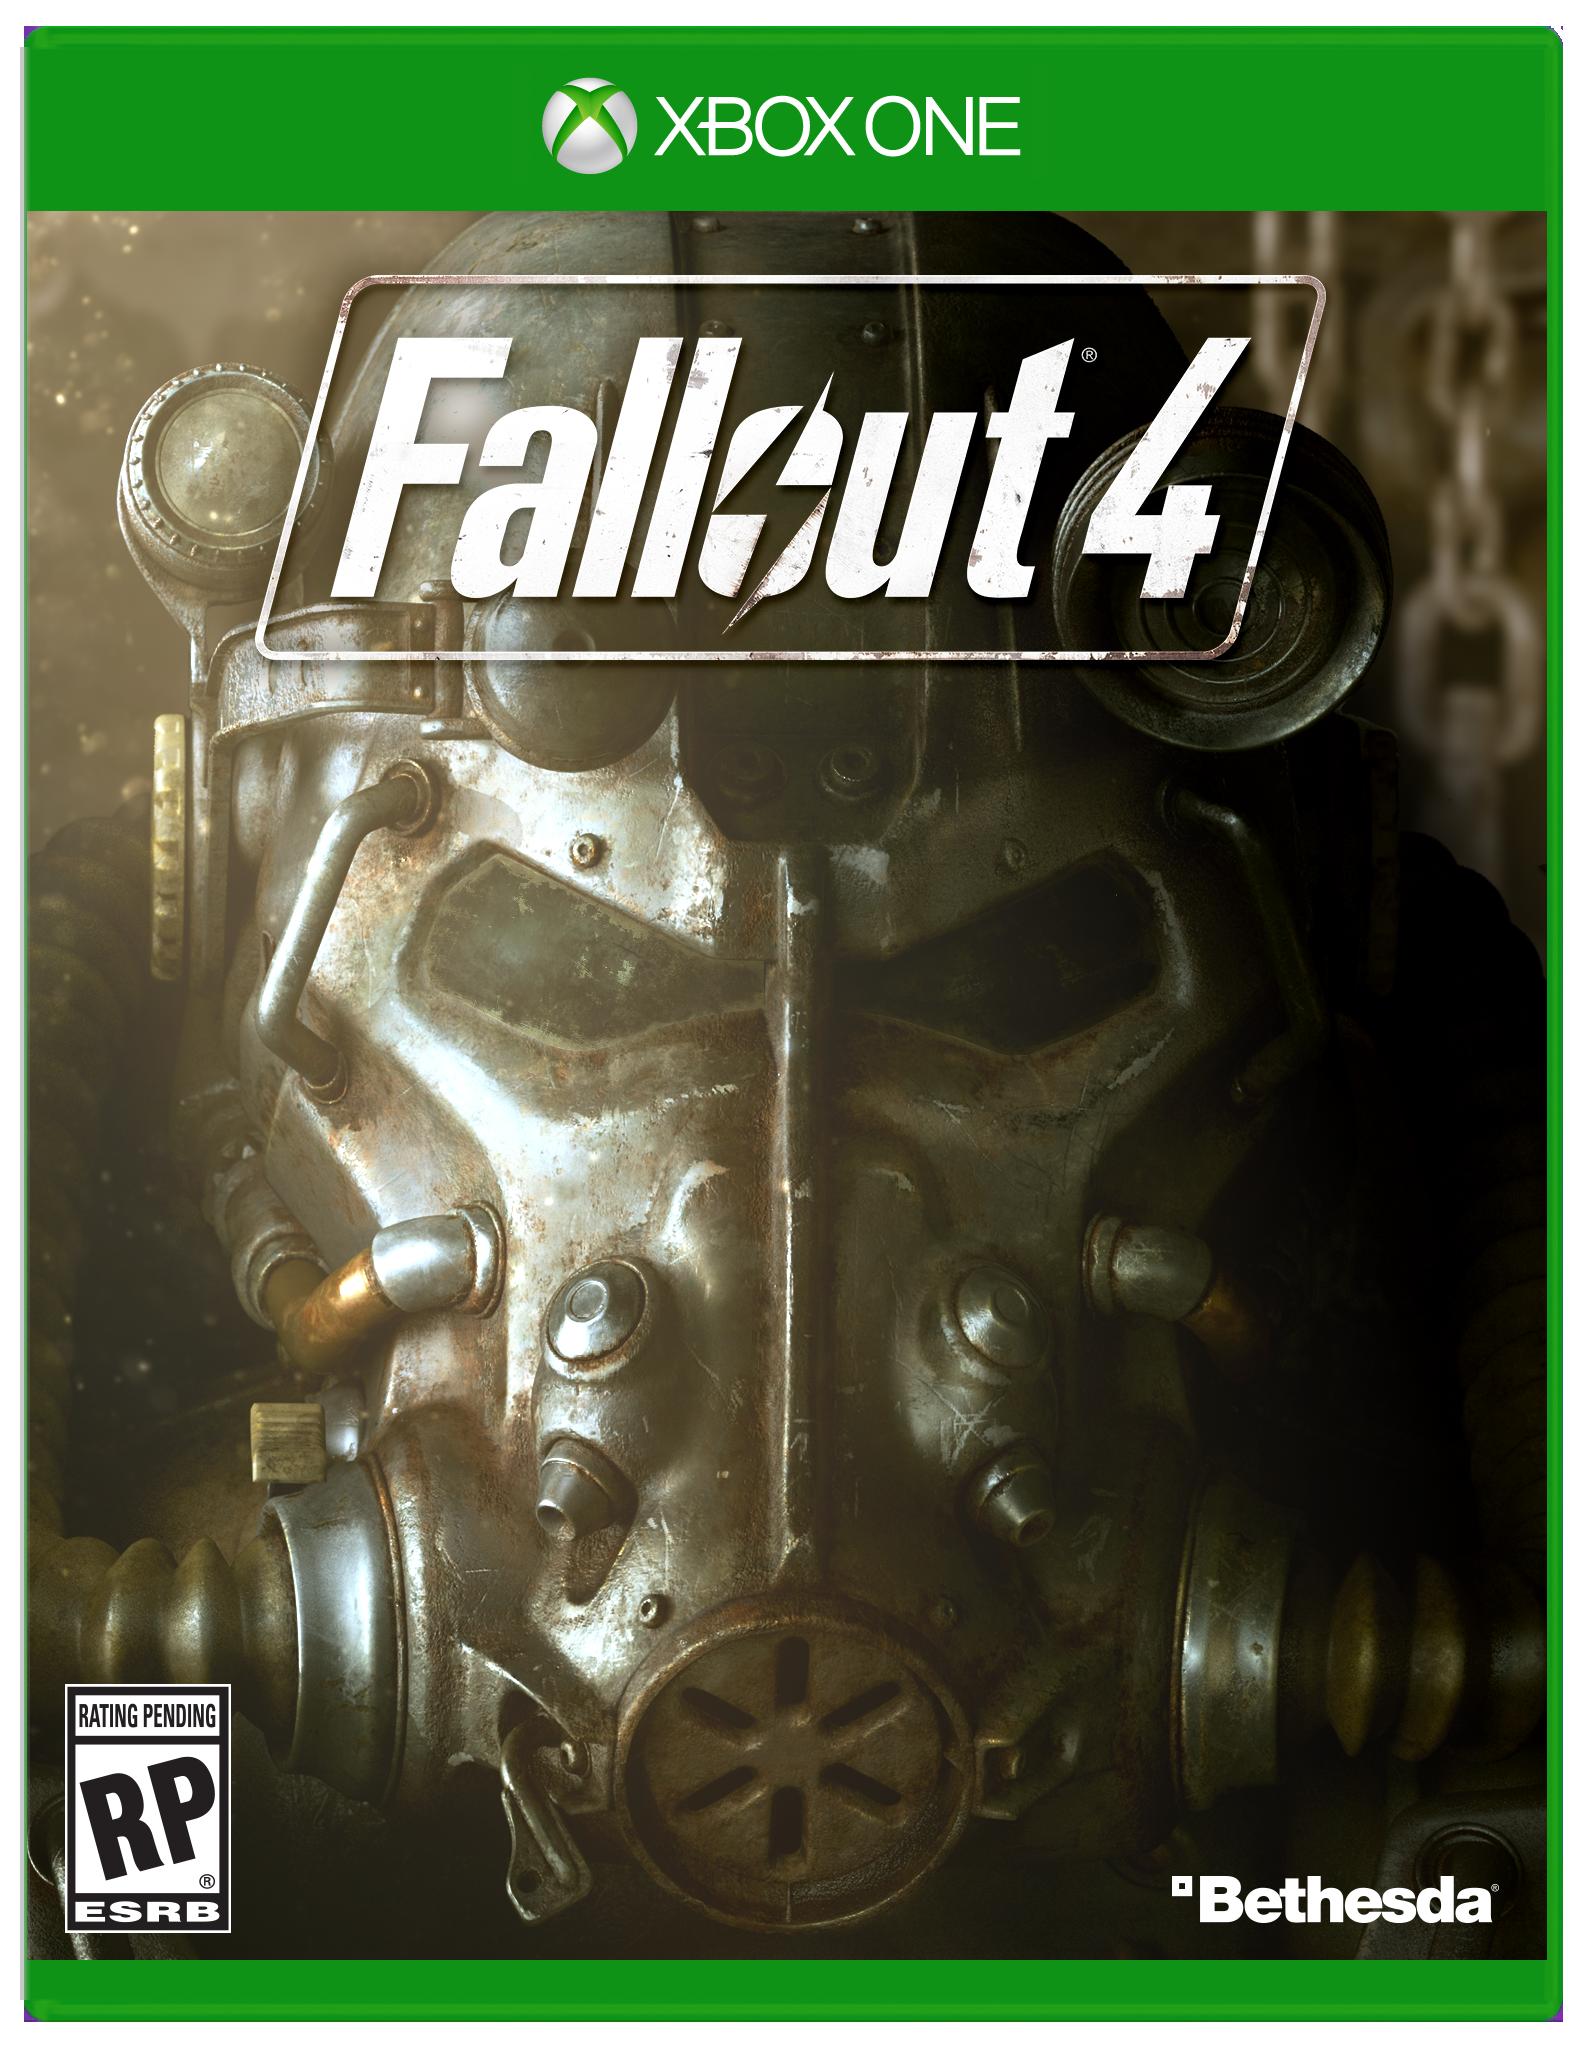 Fallout 4 Xbox One - Digital Code